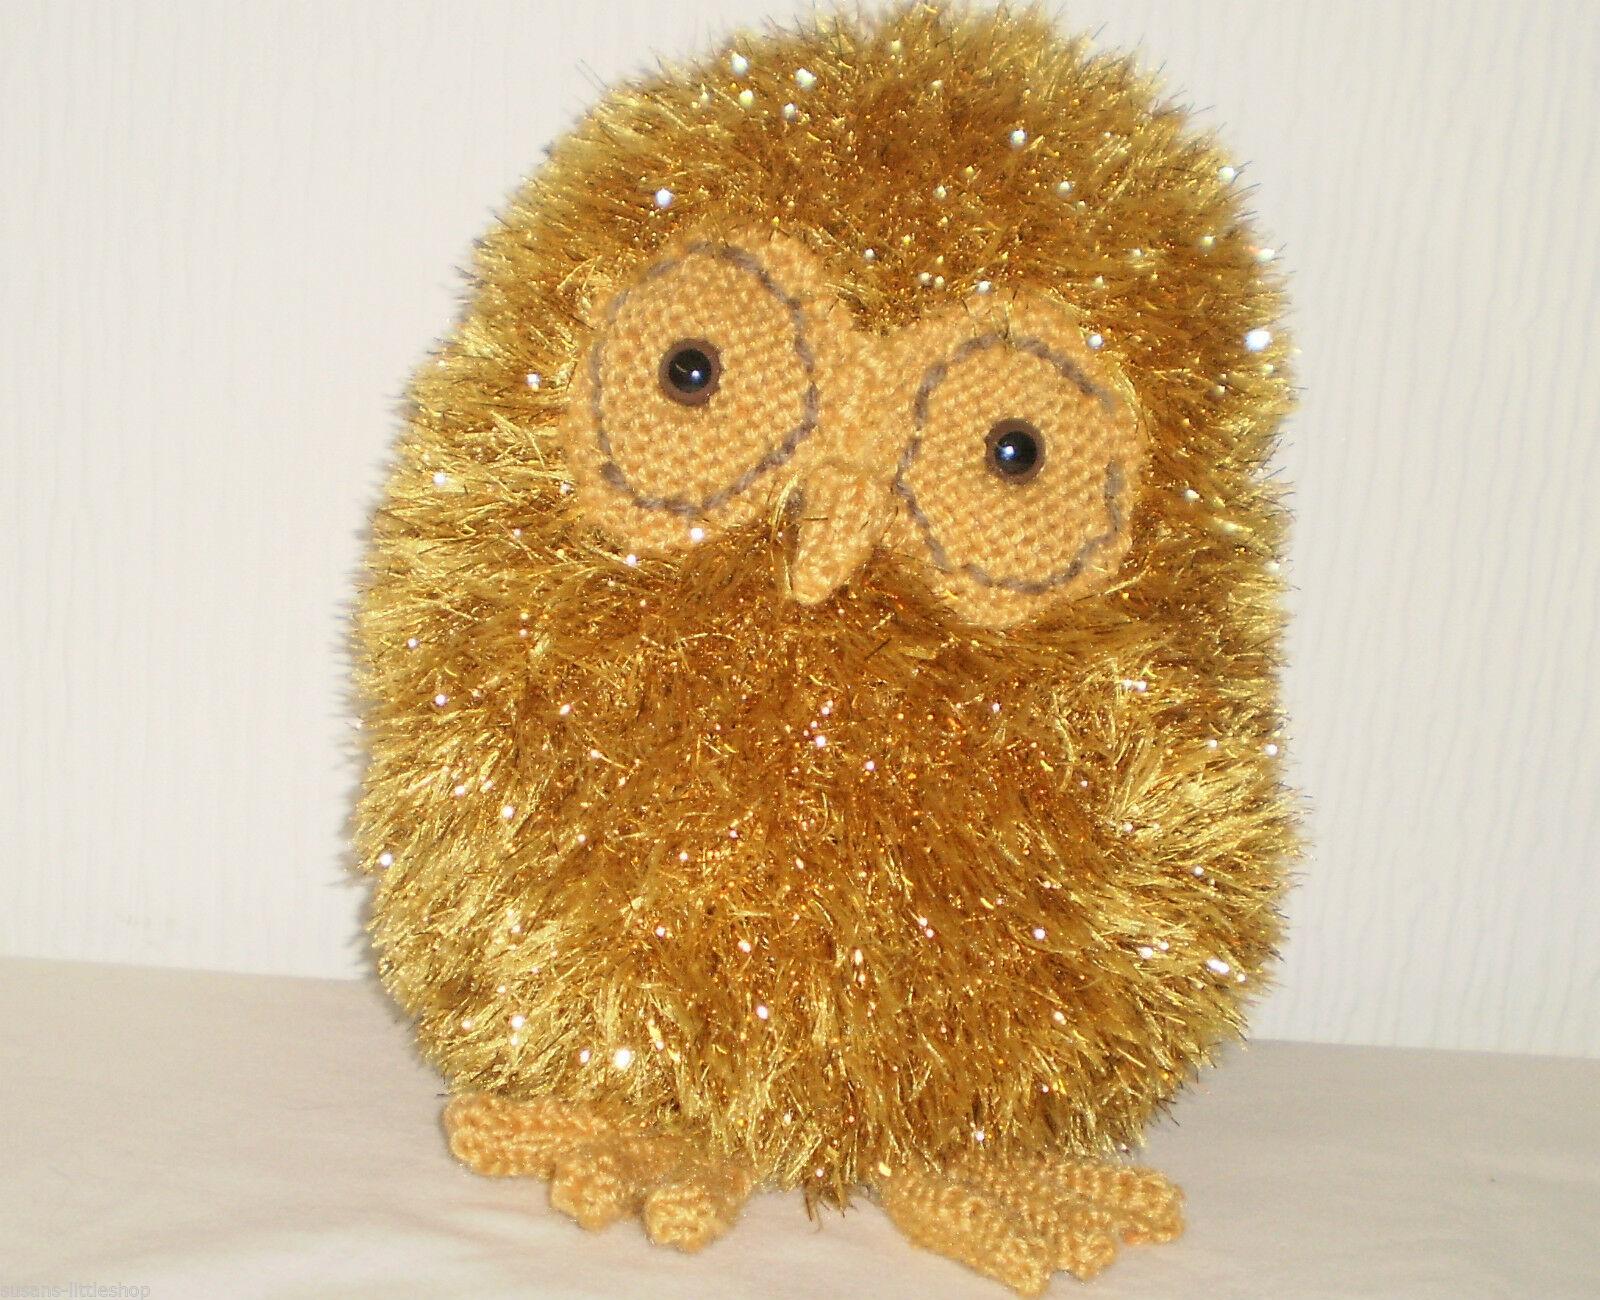 Fluffy Gold Sparkly Hand made Soft Toy Plush Bird Owl